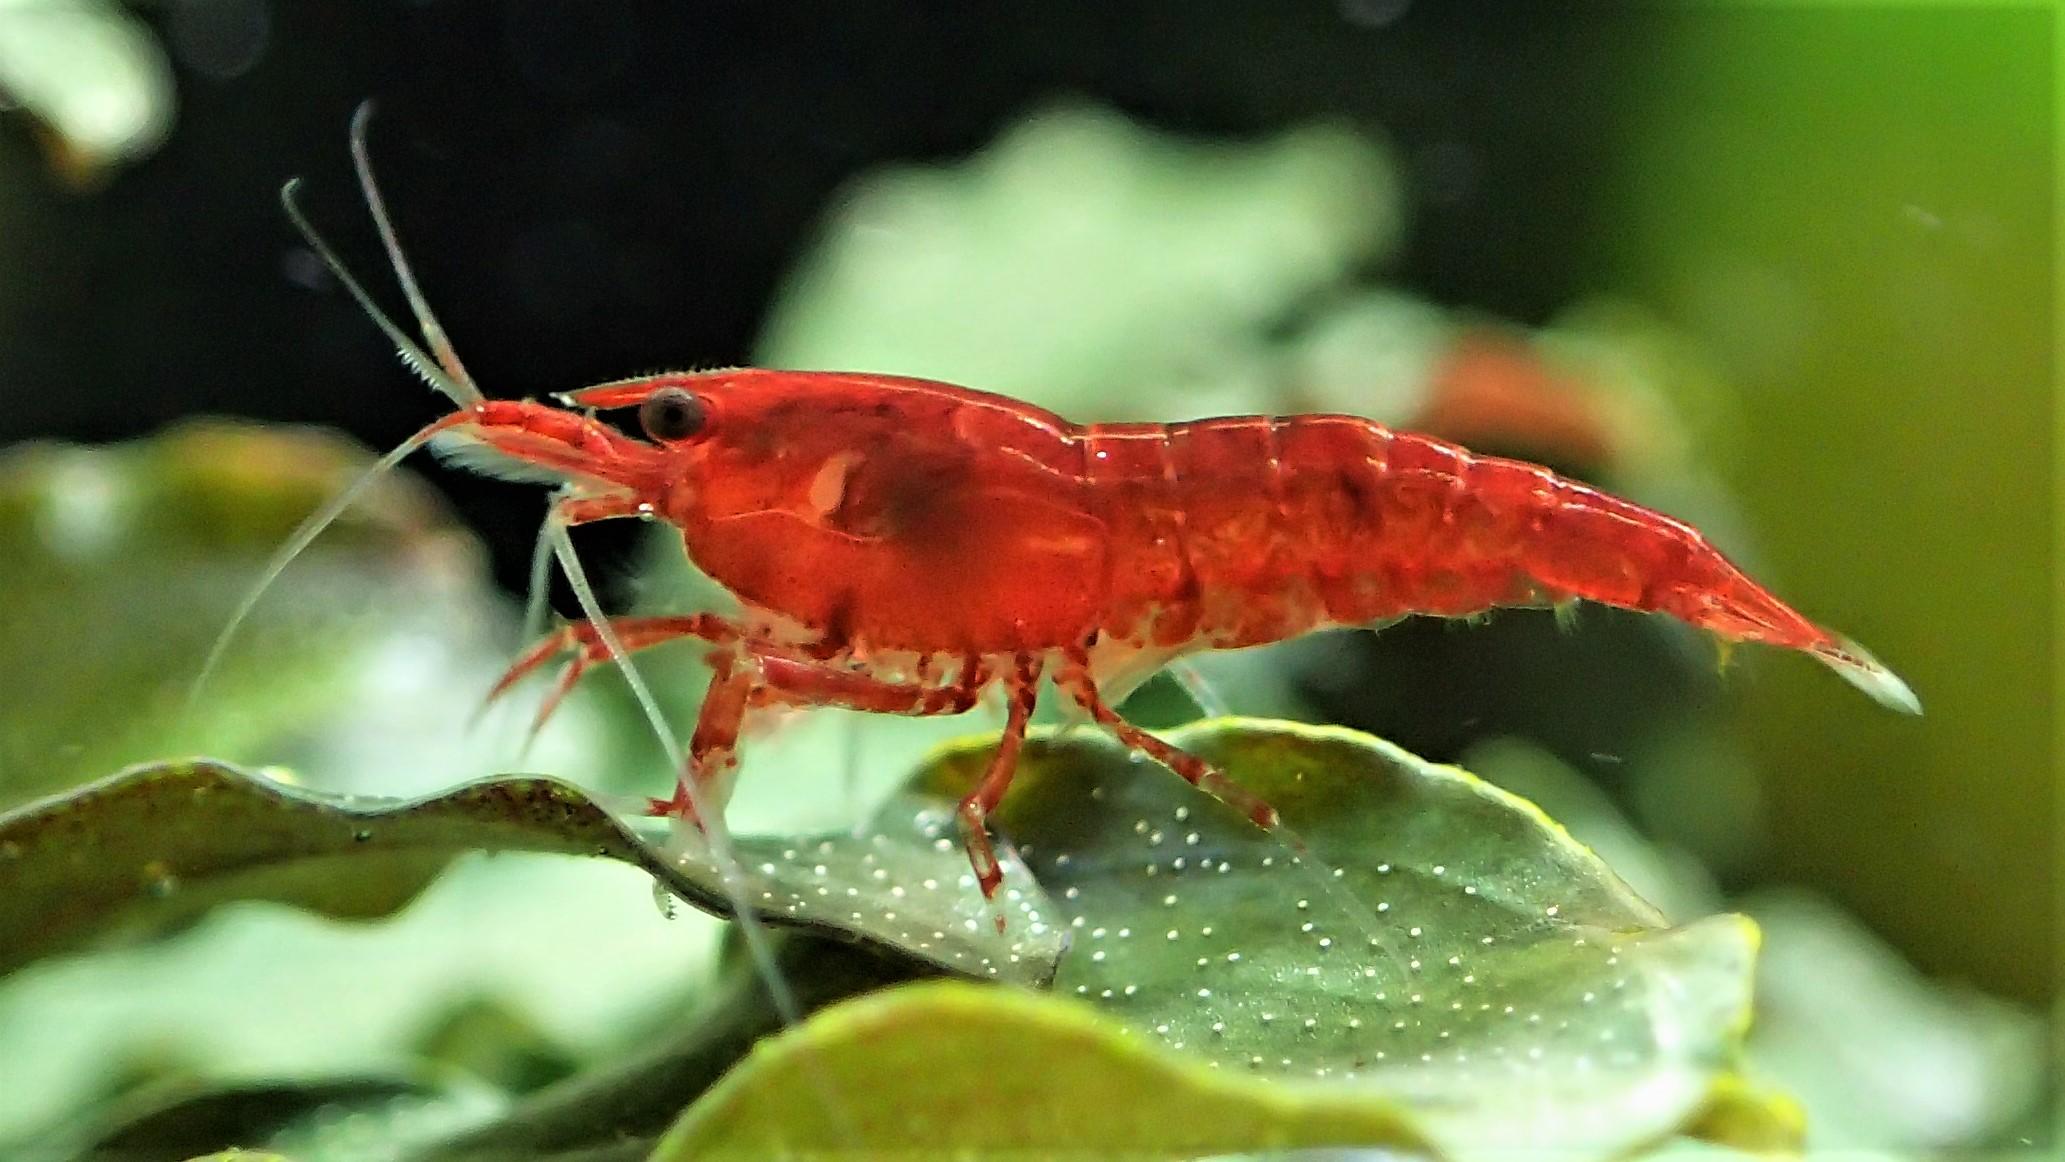 Male Cherry Shrimp